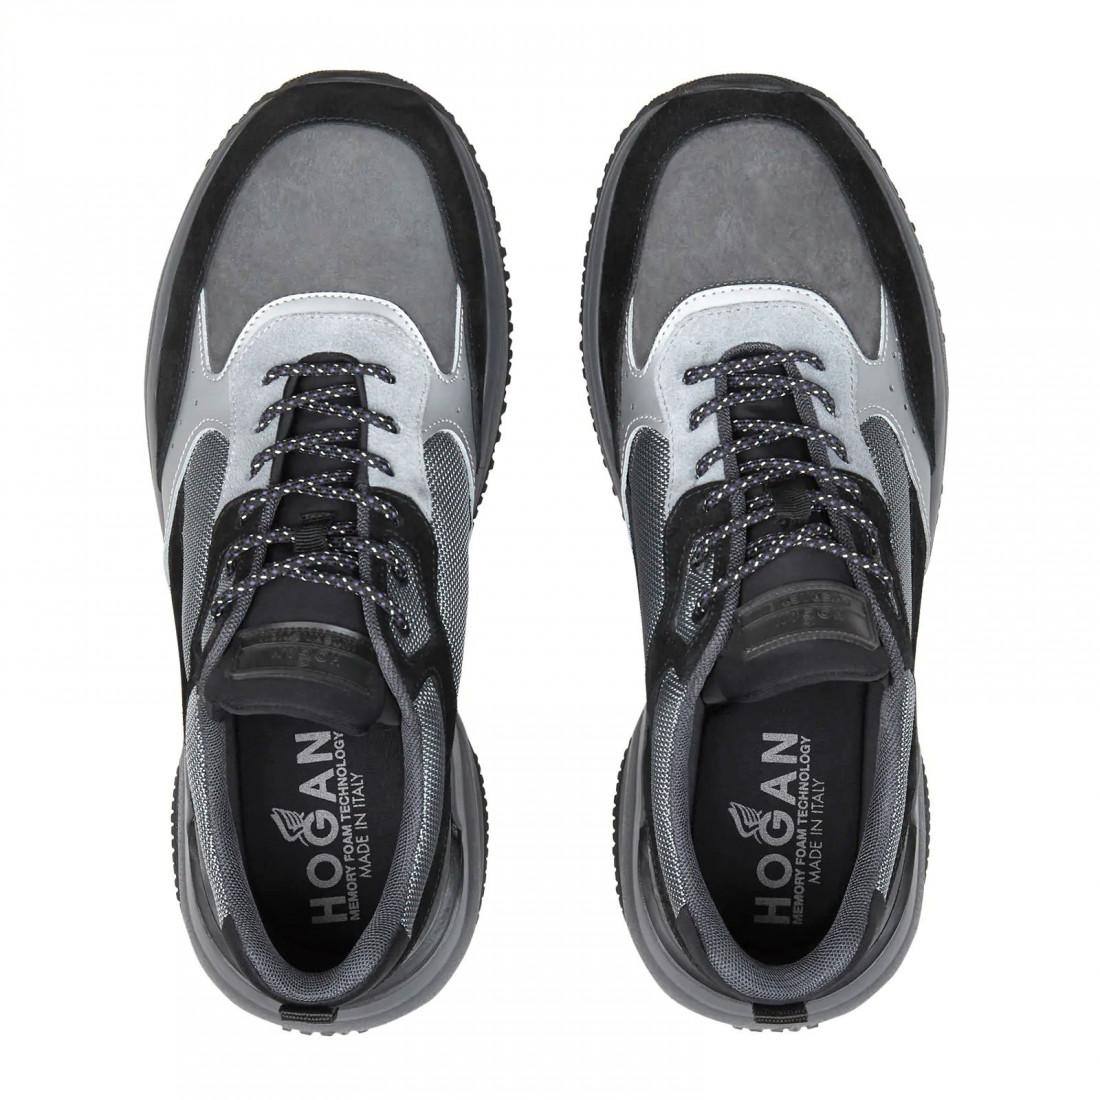 sneakers uomo hogan hxm5450dh10osx837z 7682